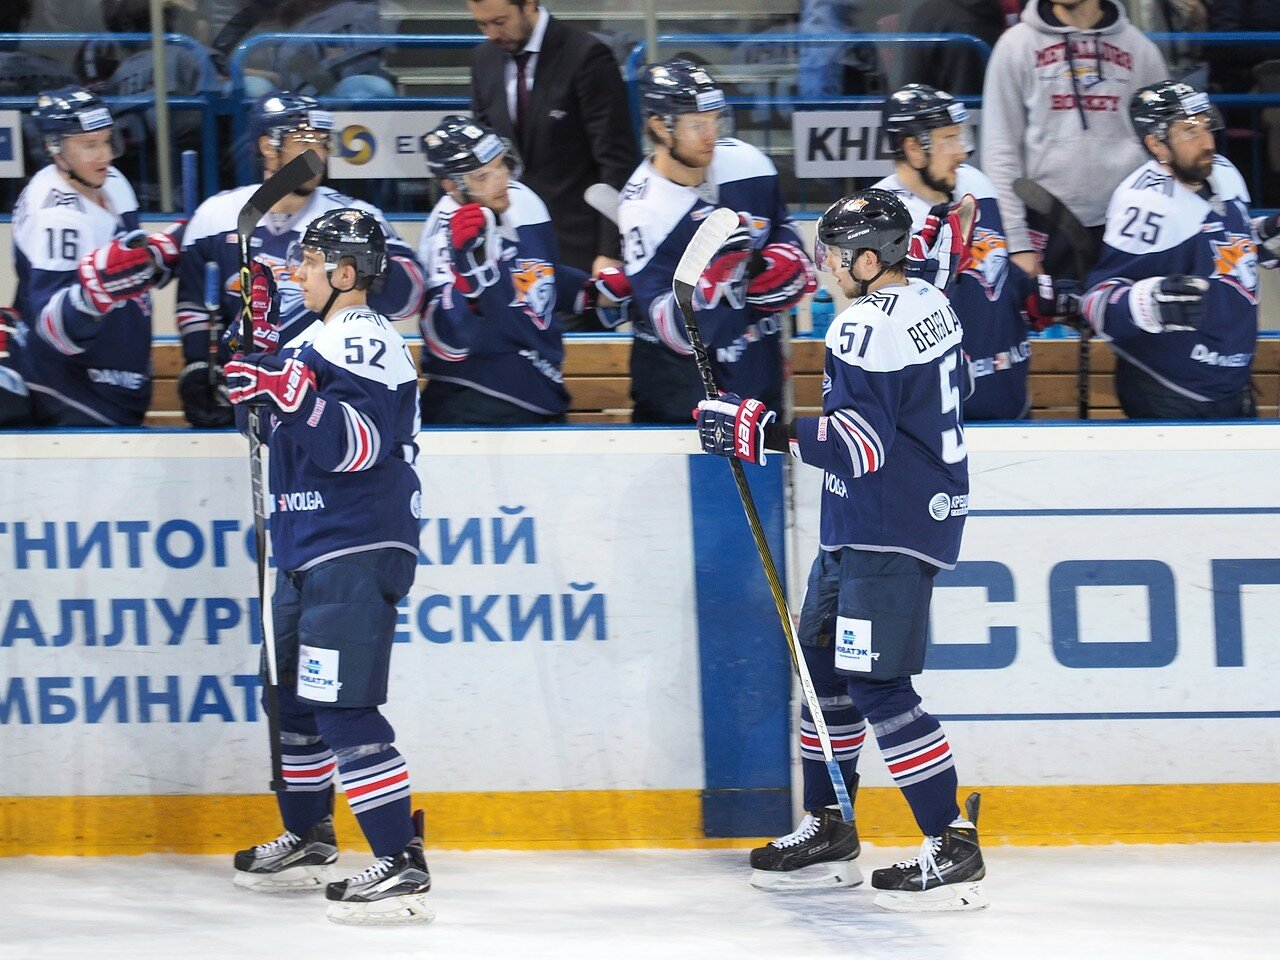 29Плей-офф 2016 Восток Финал Металлург - Салават Юлаев 25.03.2016